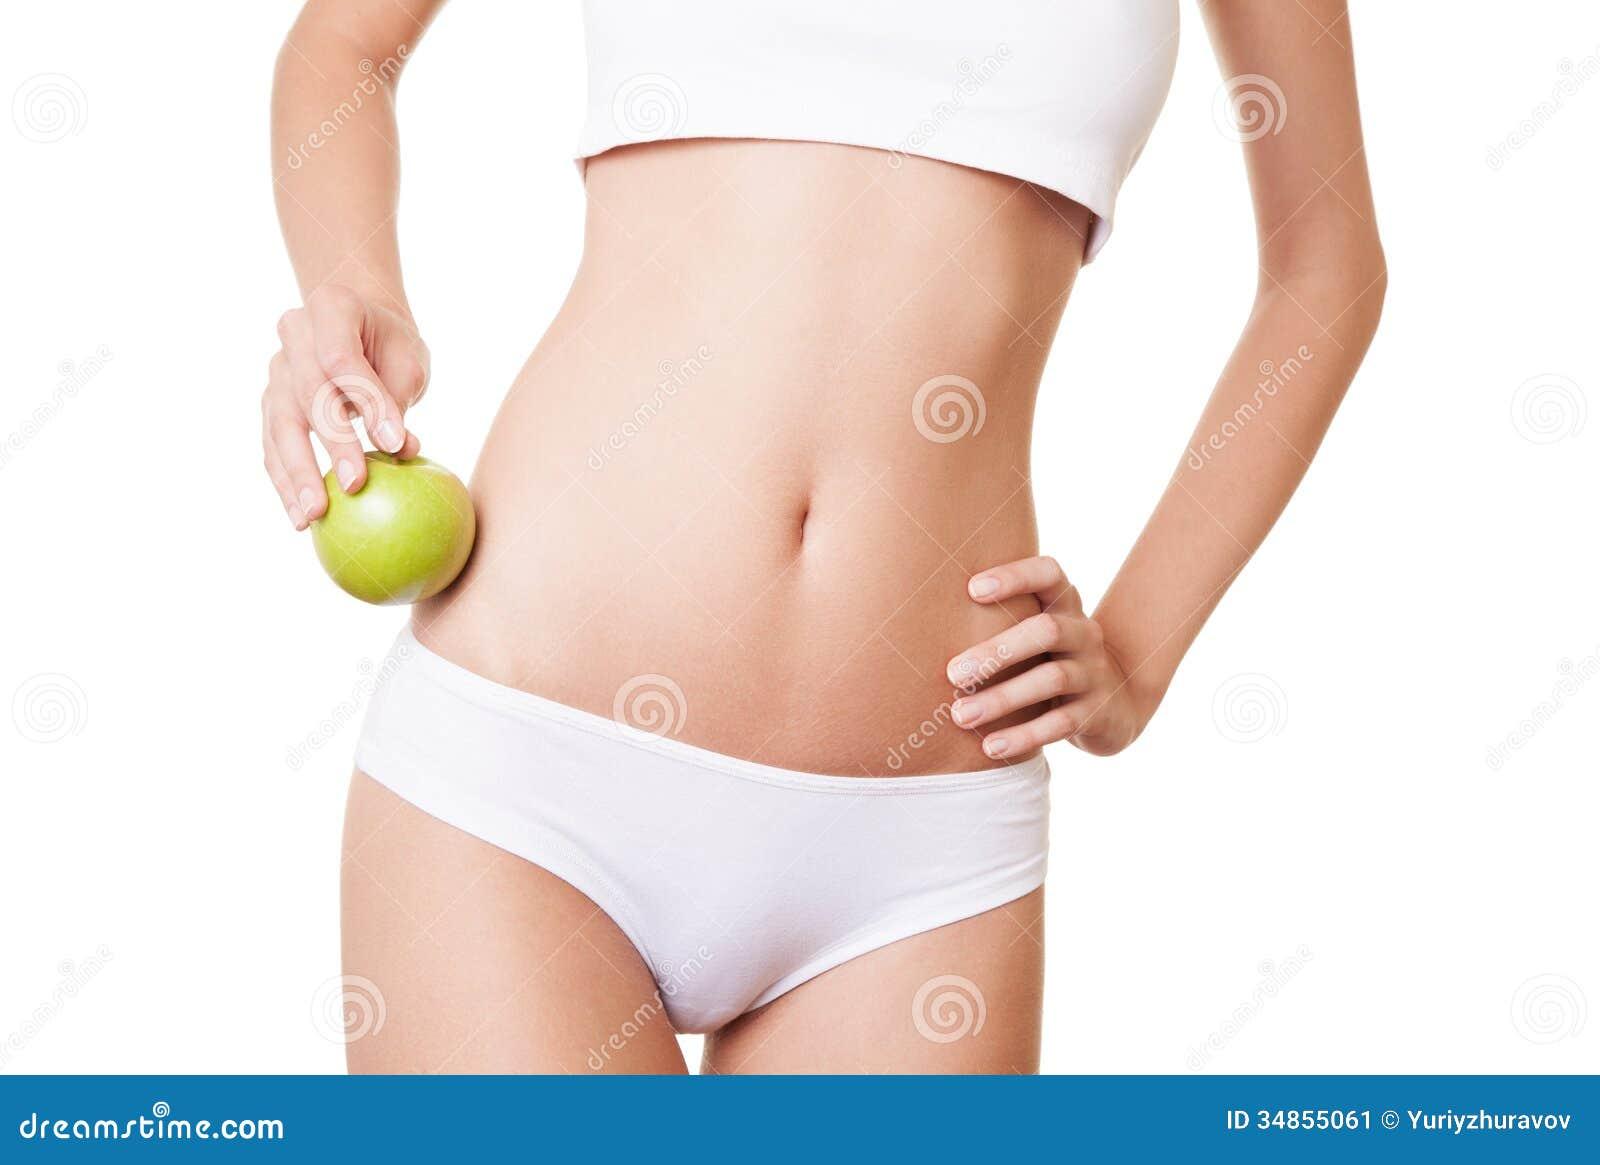 perfect-slim-woman-body-diet-concept-app